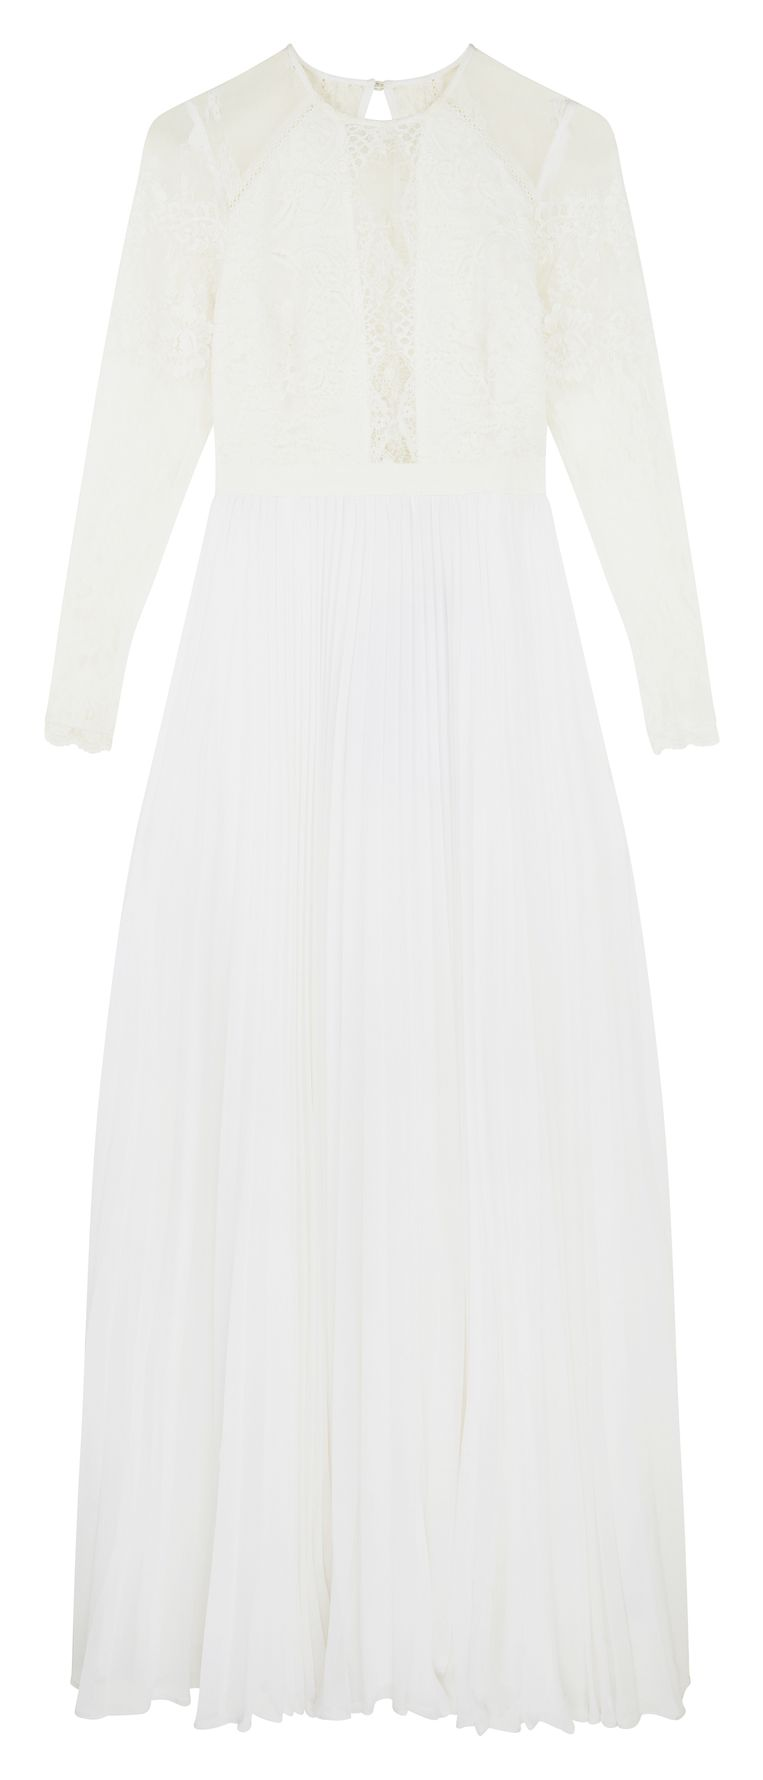 Lange jurk van Asos, € 103,99. Beeld rv